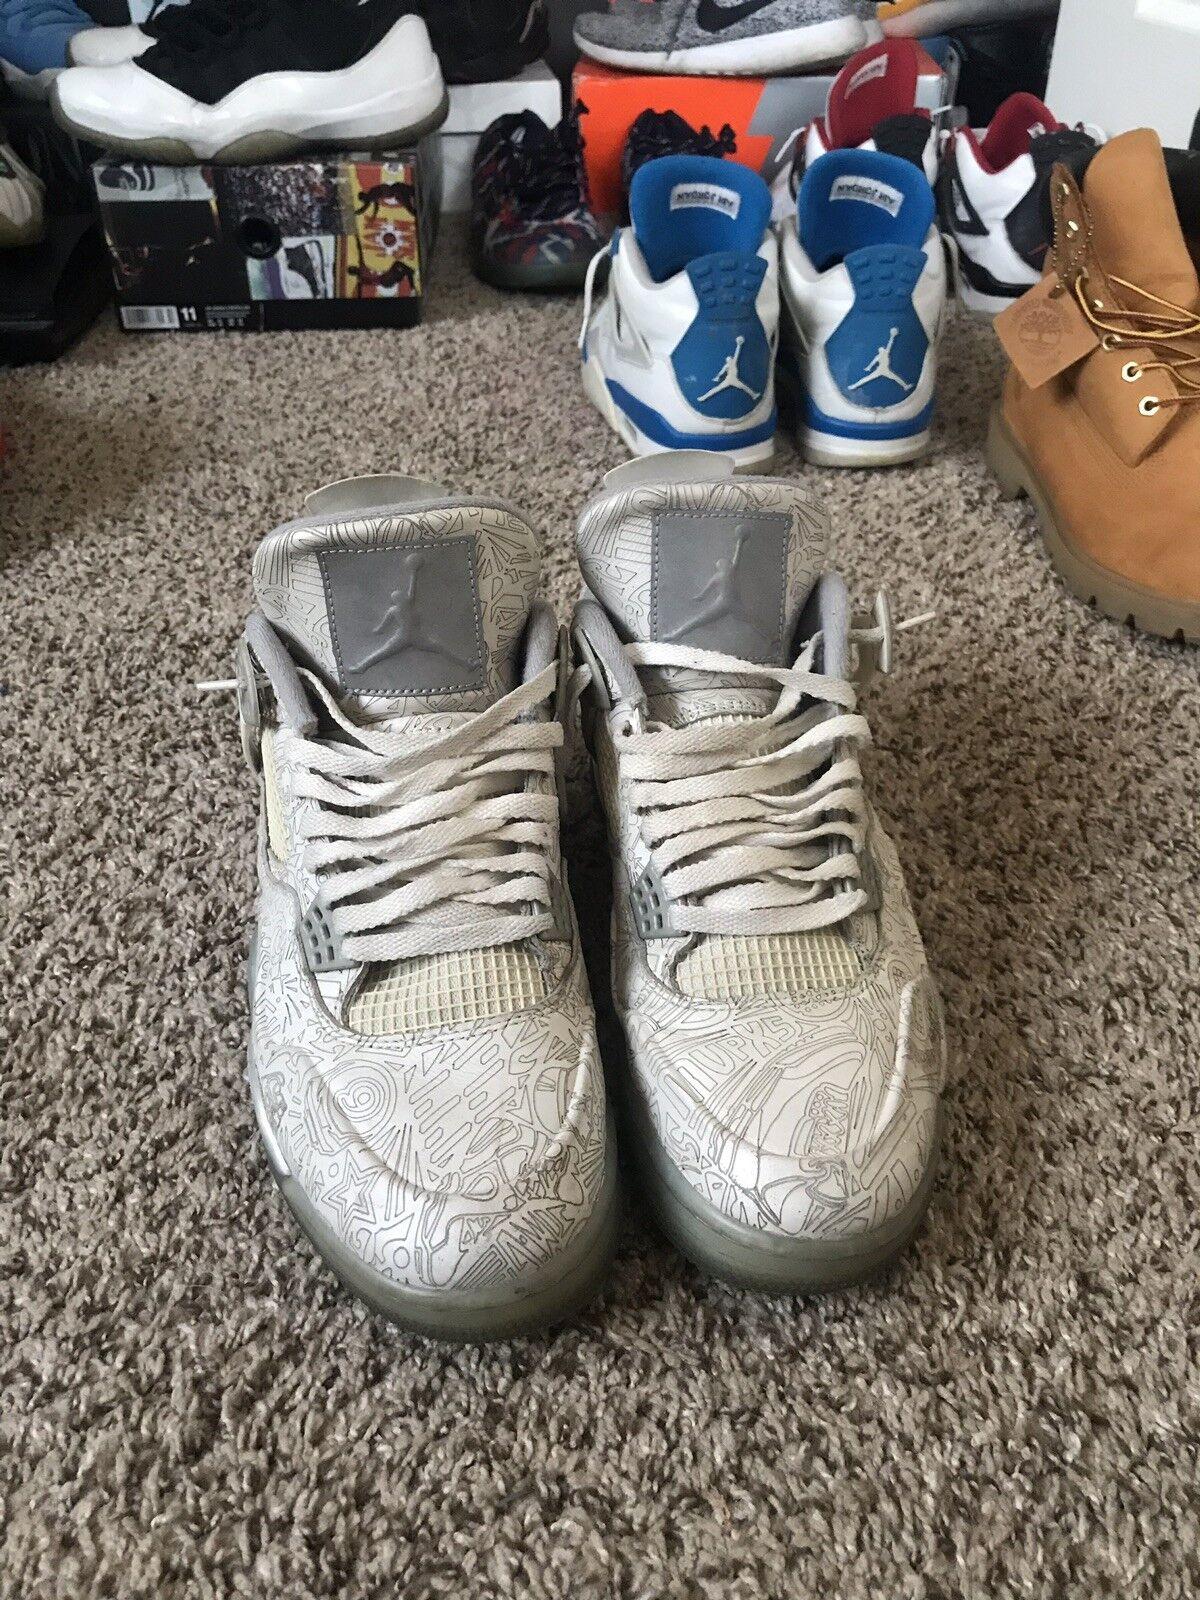 70d21b607e Jordan 4 Laser Air Retro nqqlao1413-Athletic Shoes - www.midwifery ...